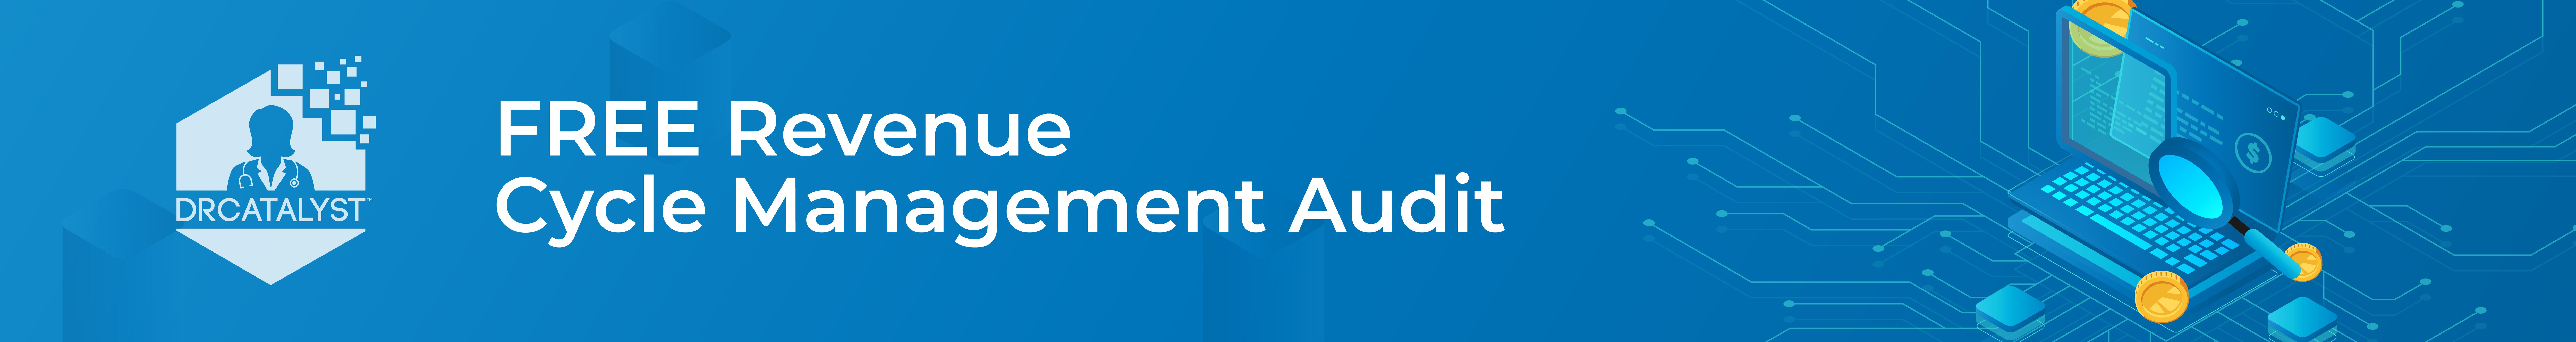 RCM Audit Image